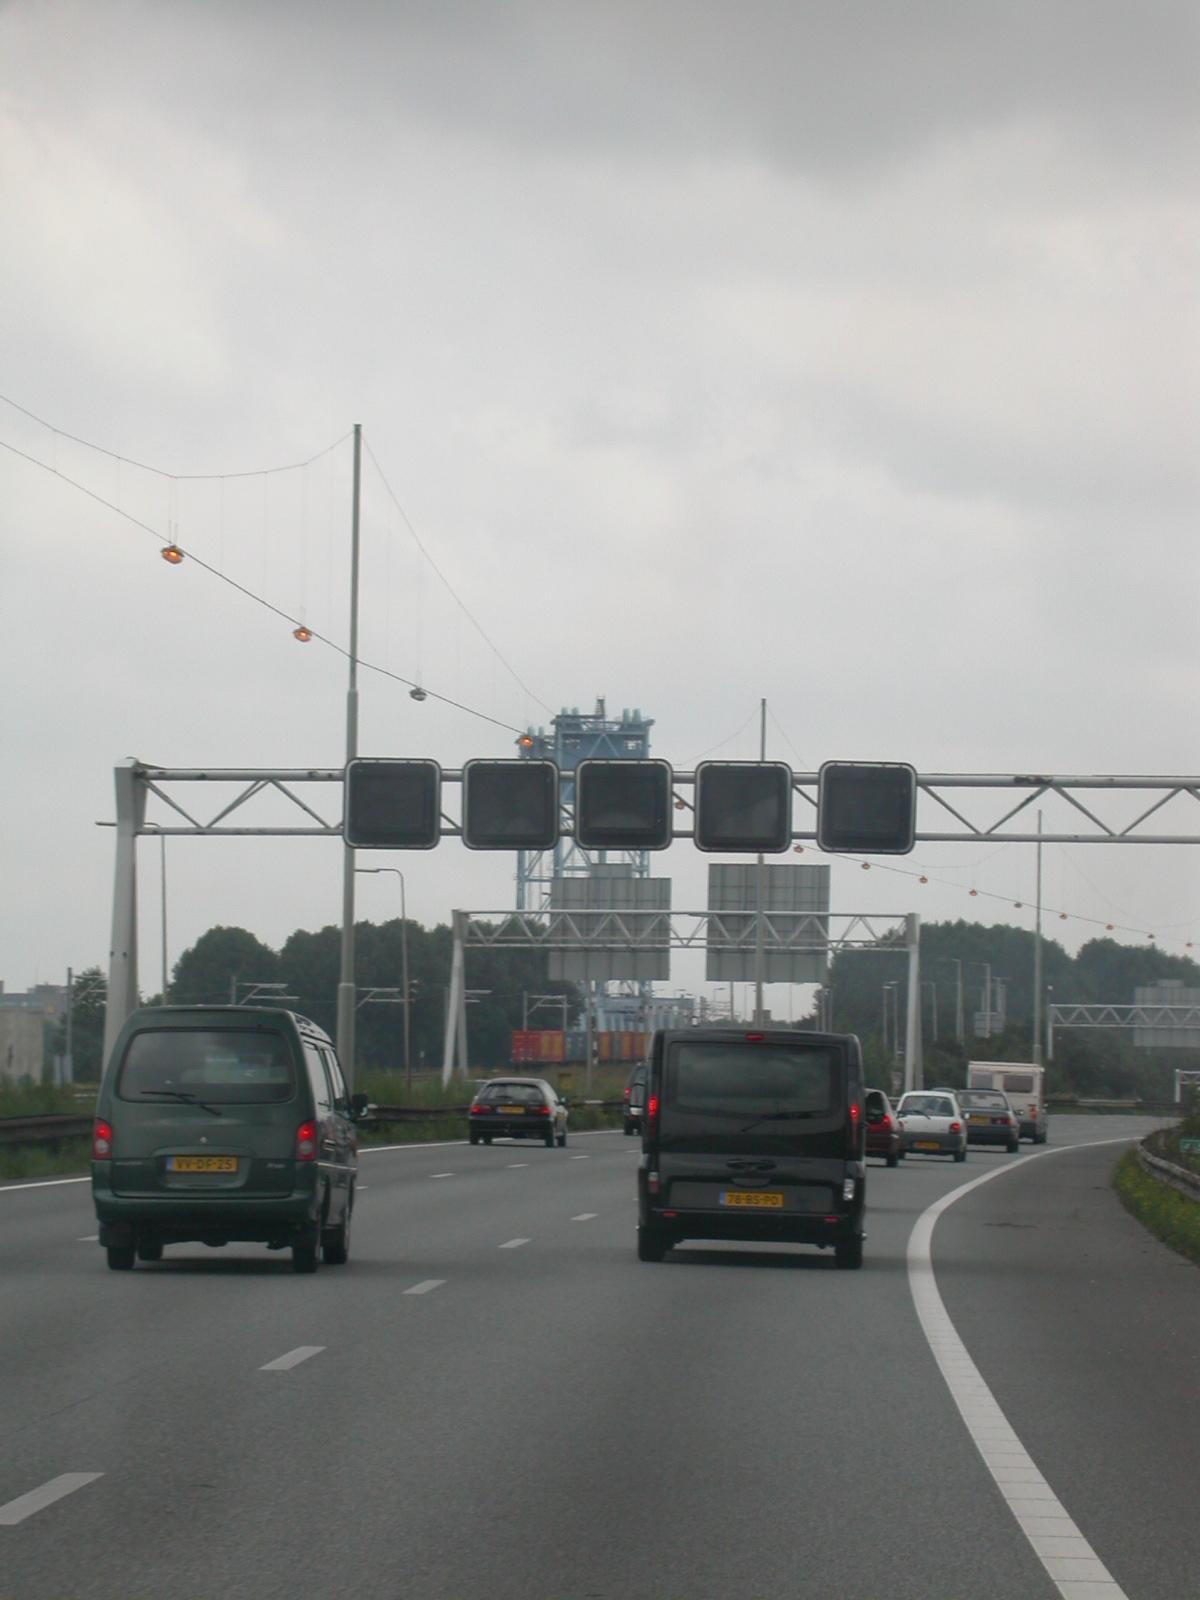 eva car cars highway freeway motorway traffic driving royalty-free